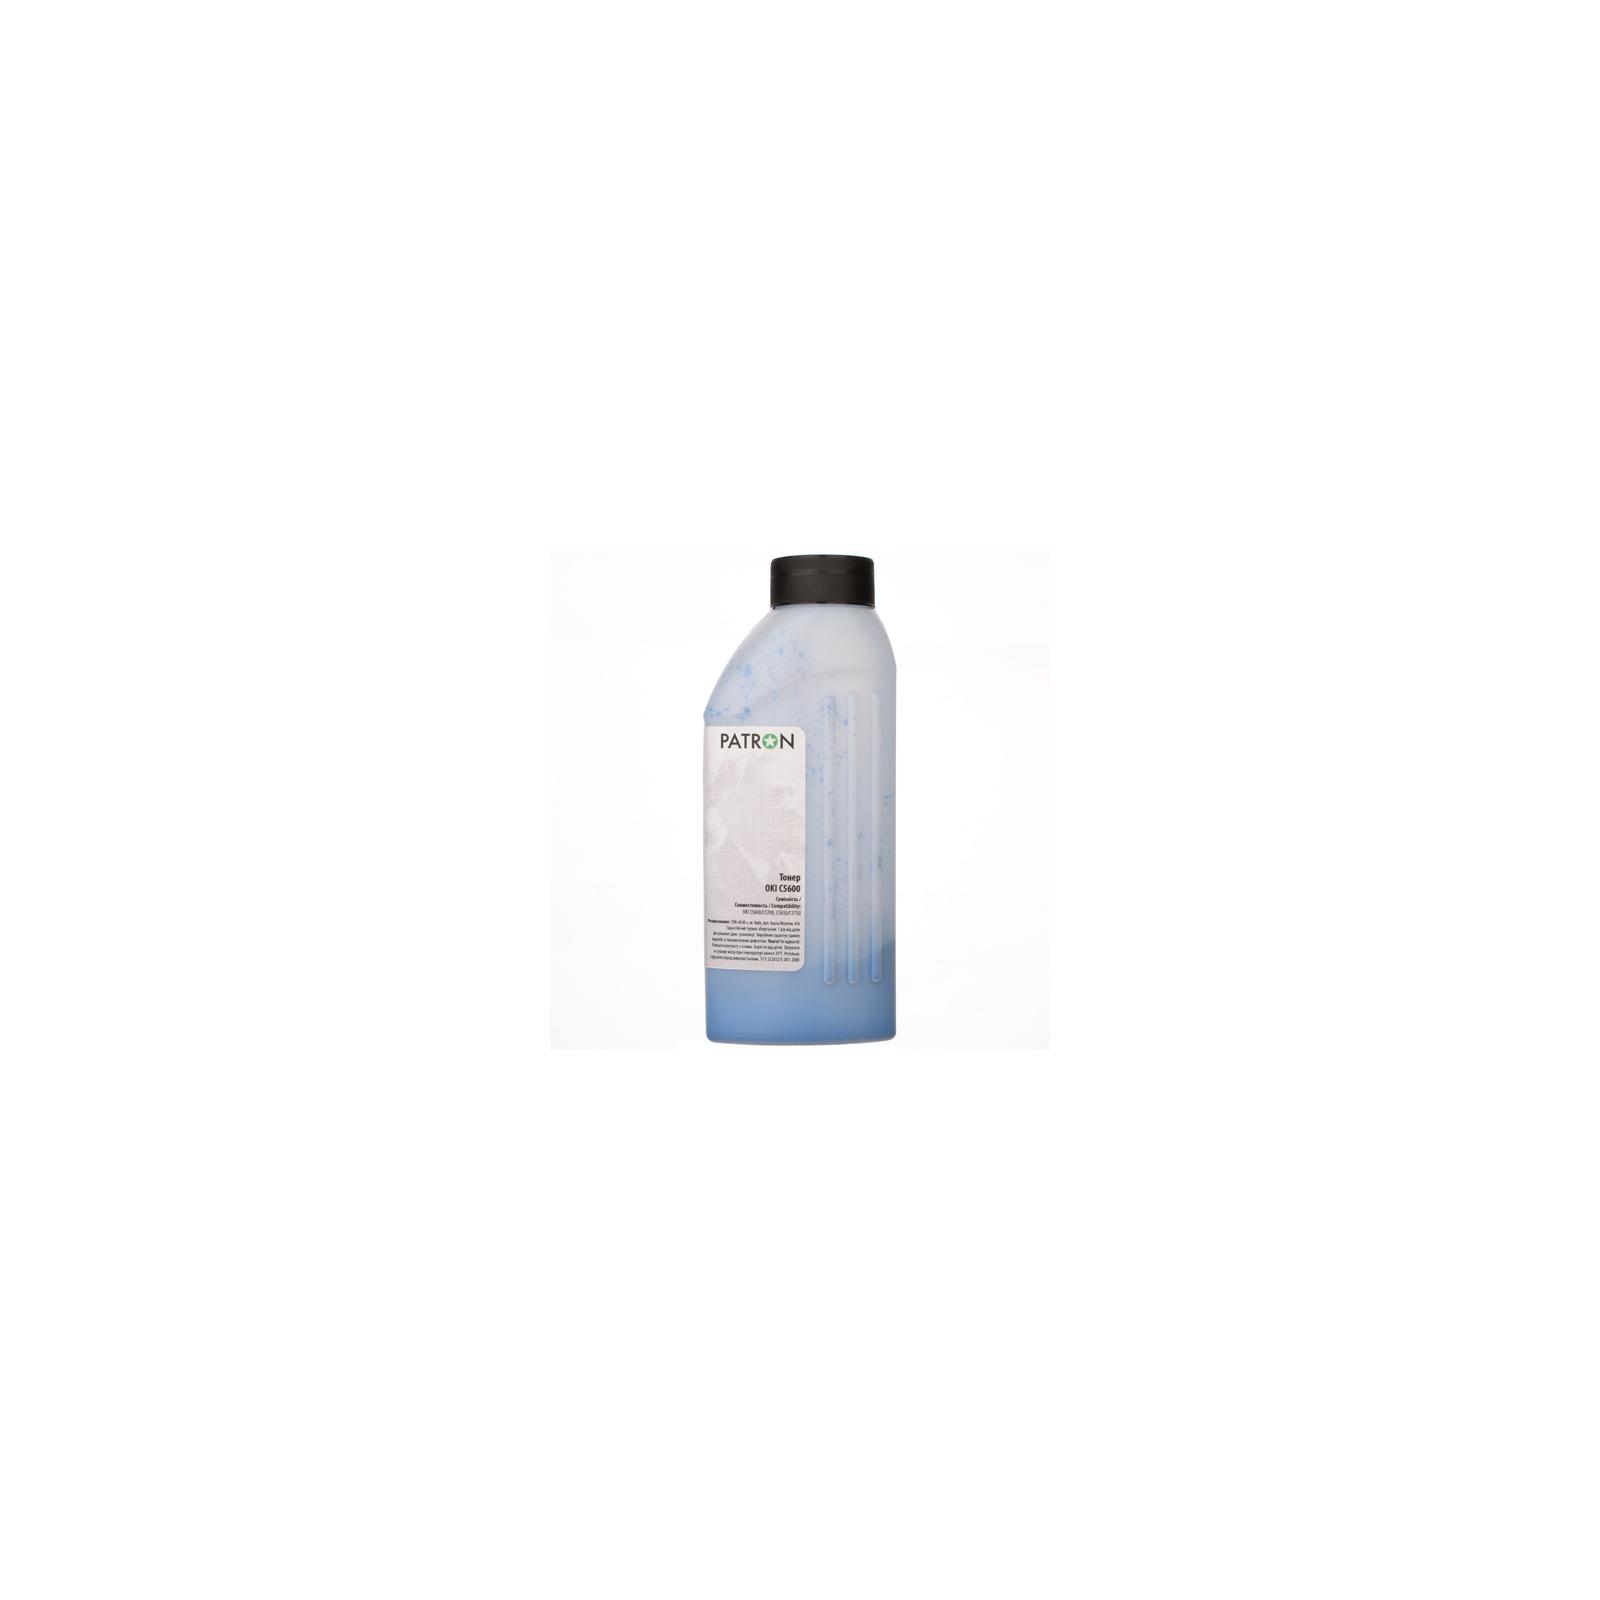 Тонер PATRON OKI C5600 CYAN 50г (T-PN-OC5600-C-050) изображение 2